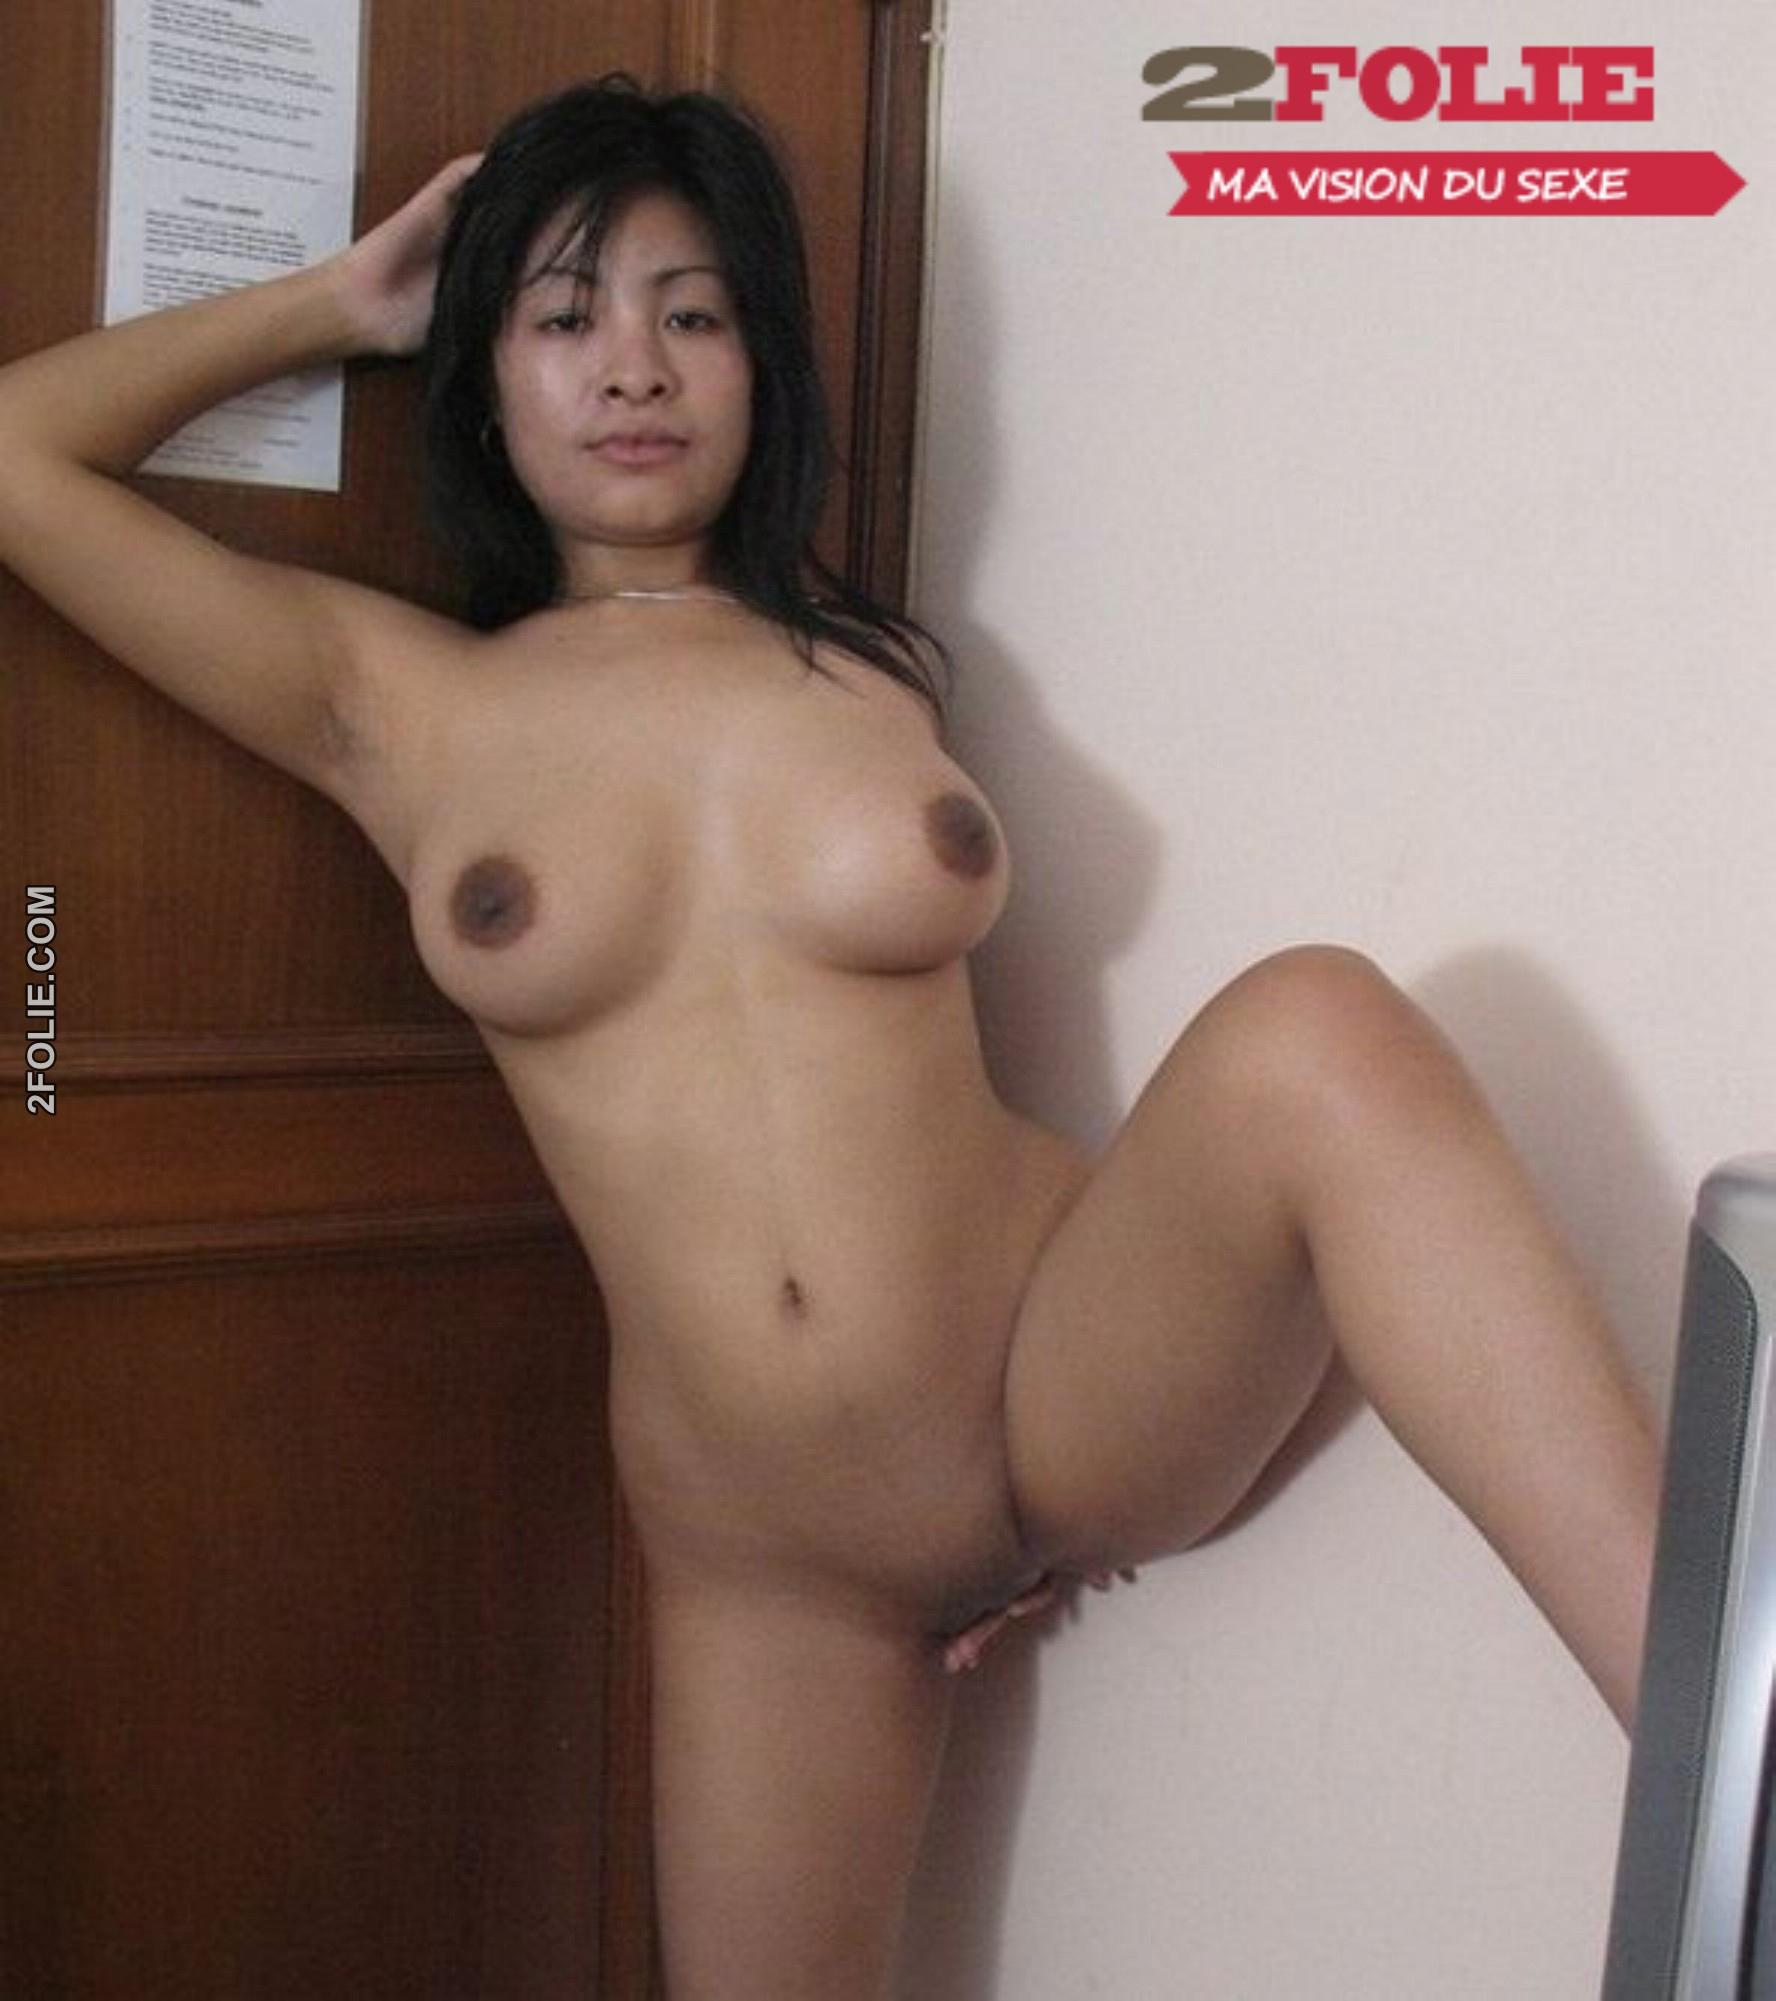 jeune fille  nue meilleur porno asiatique